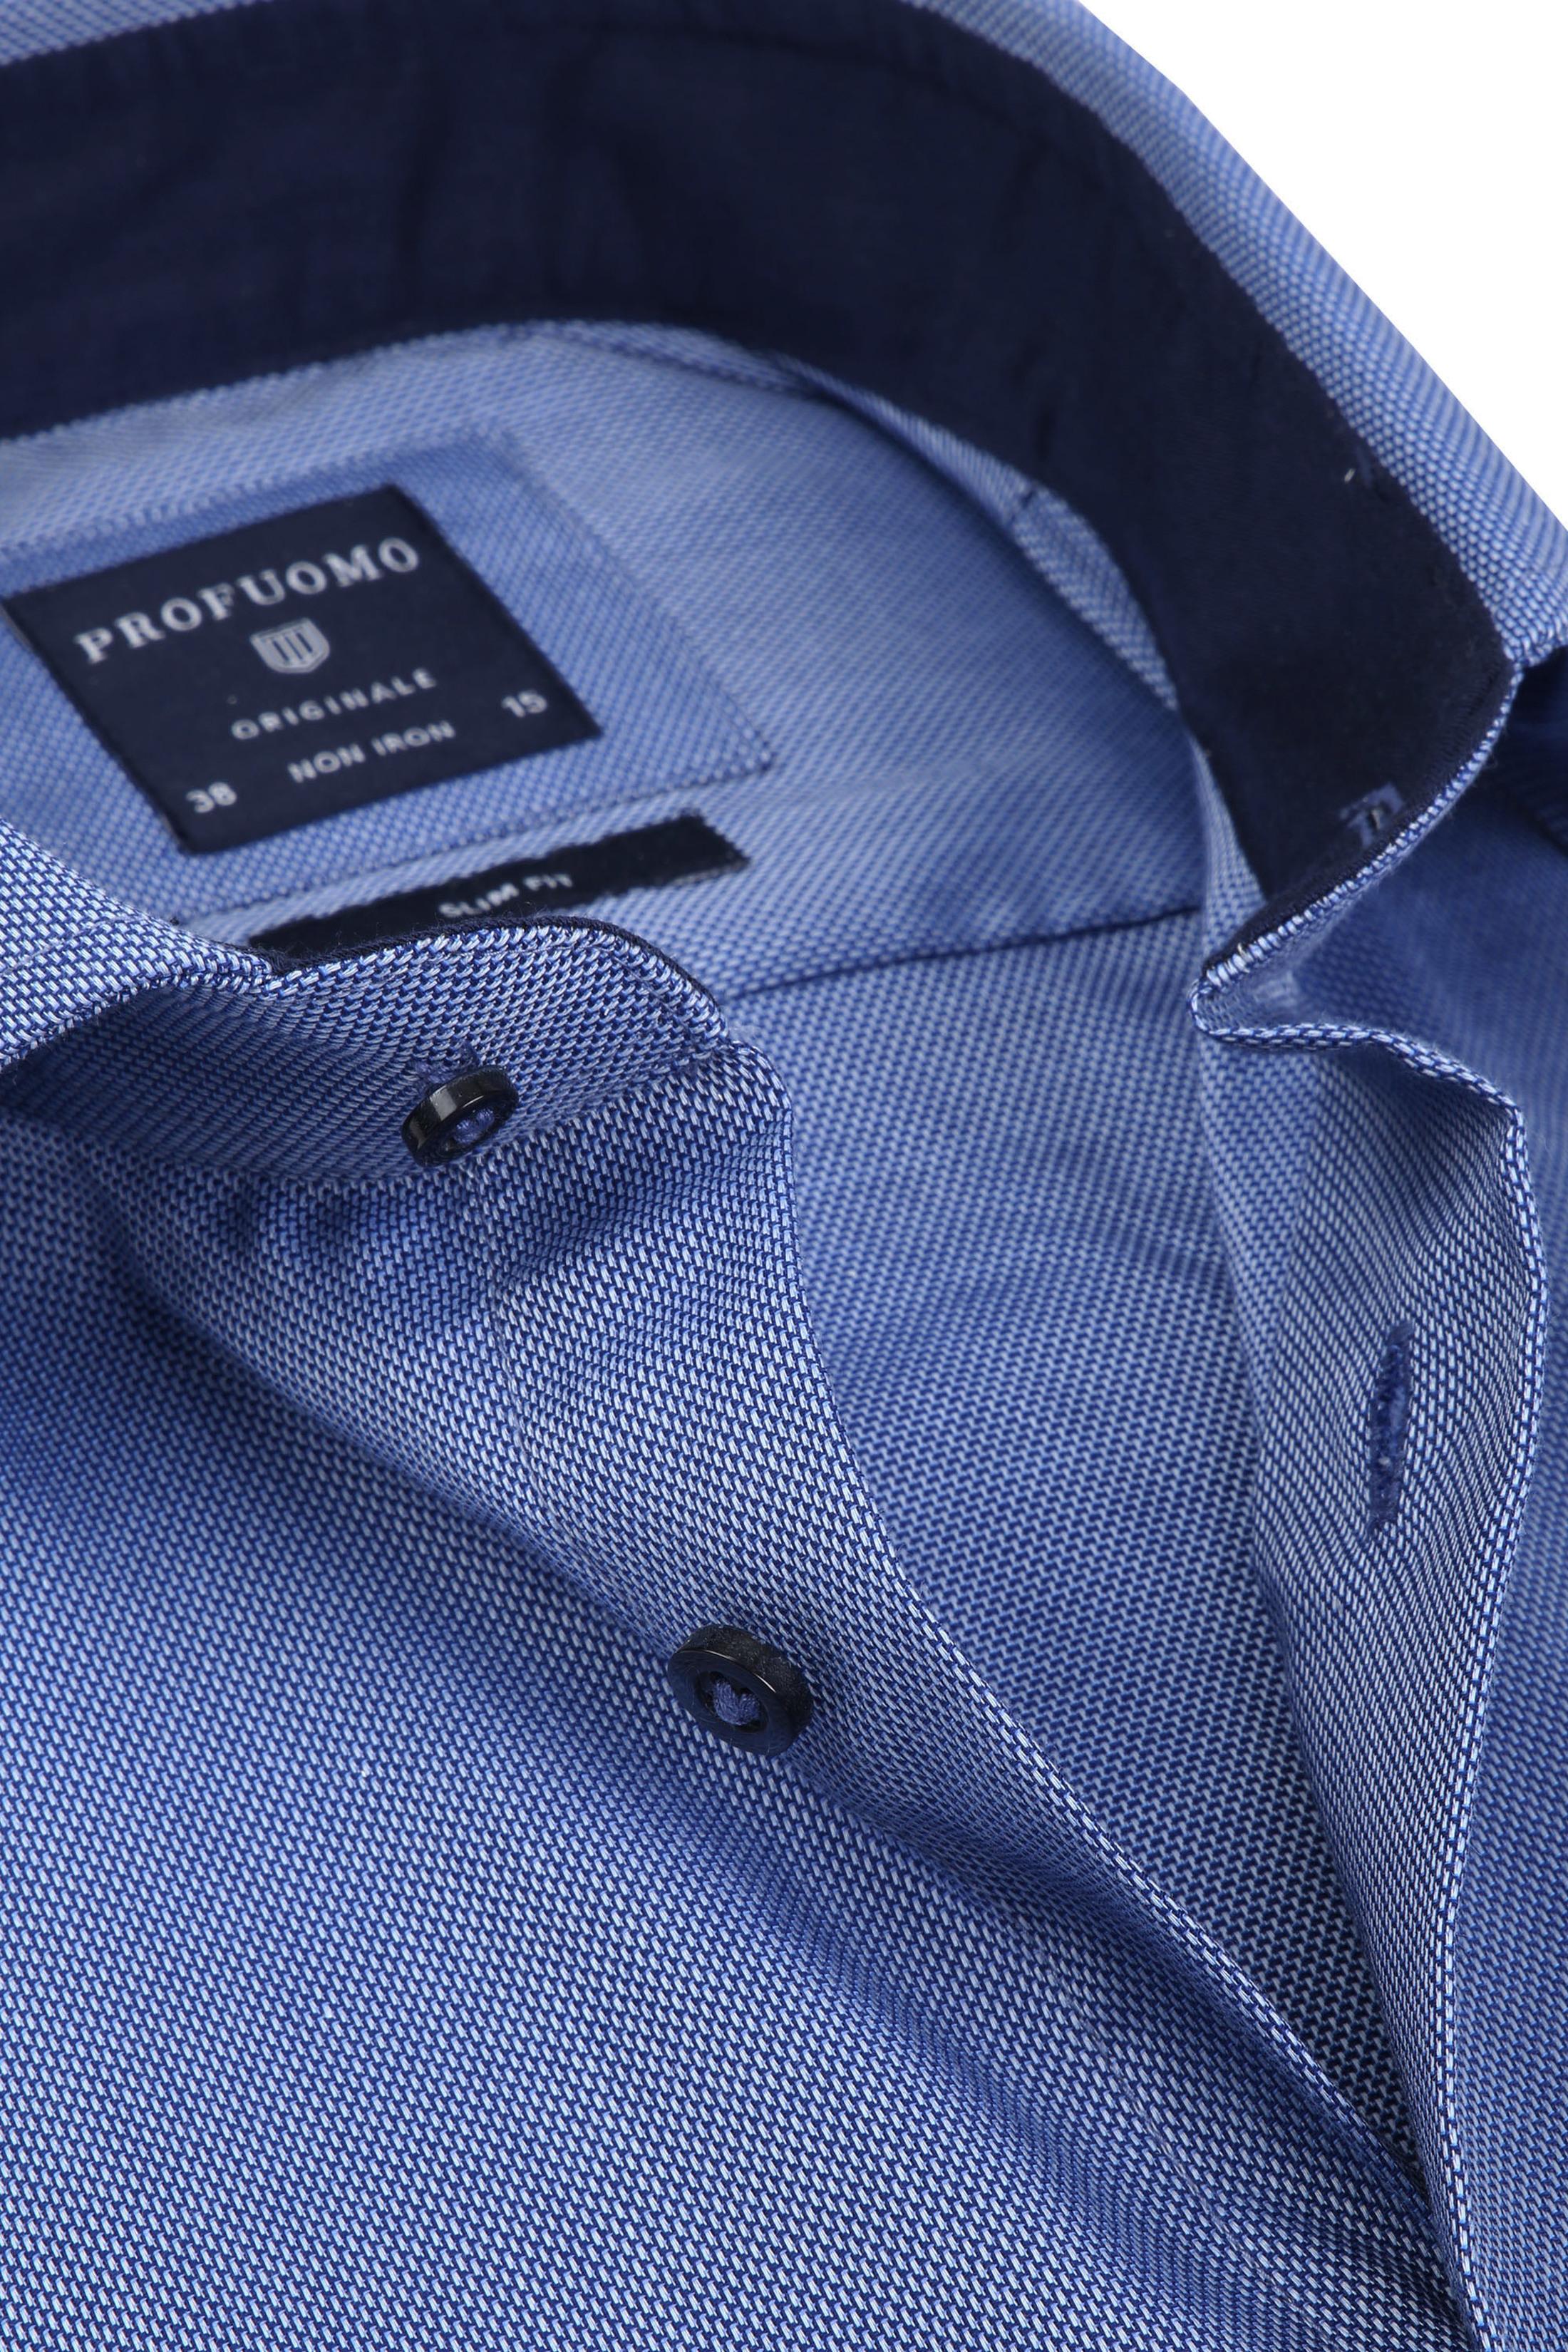 Profuomo Overhemd SF Non Iron Blauw foto 1